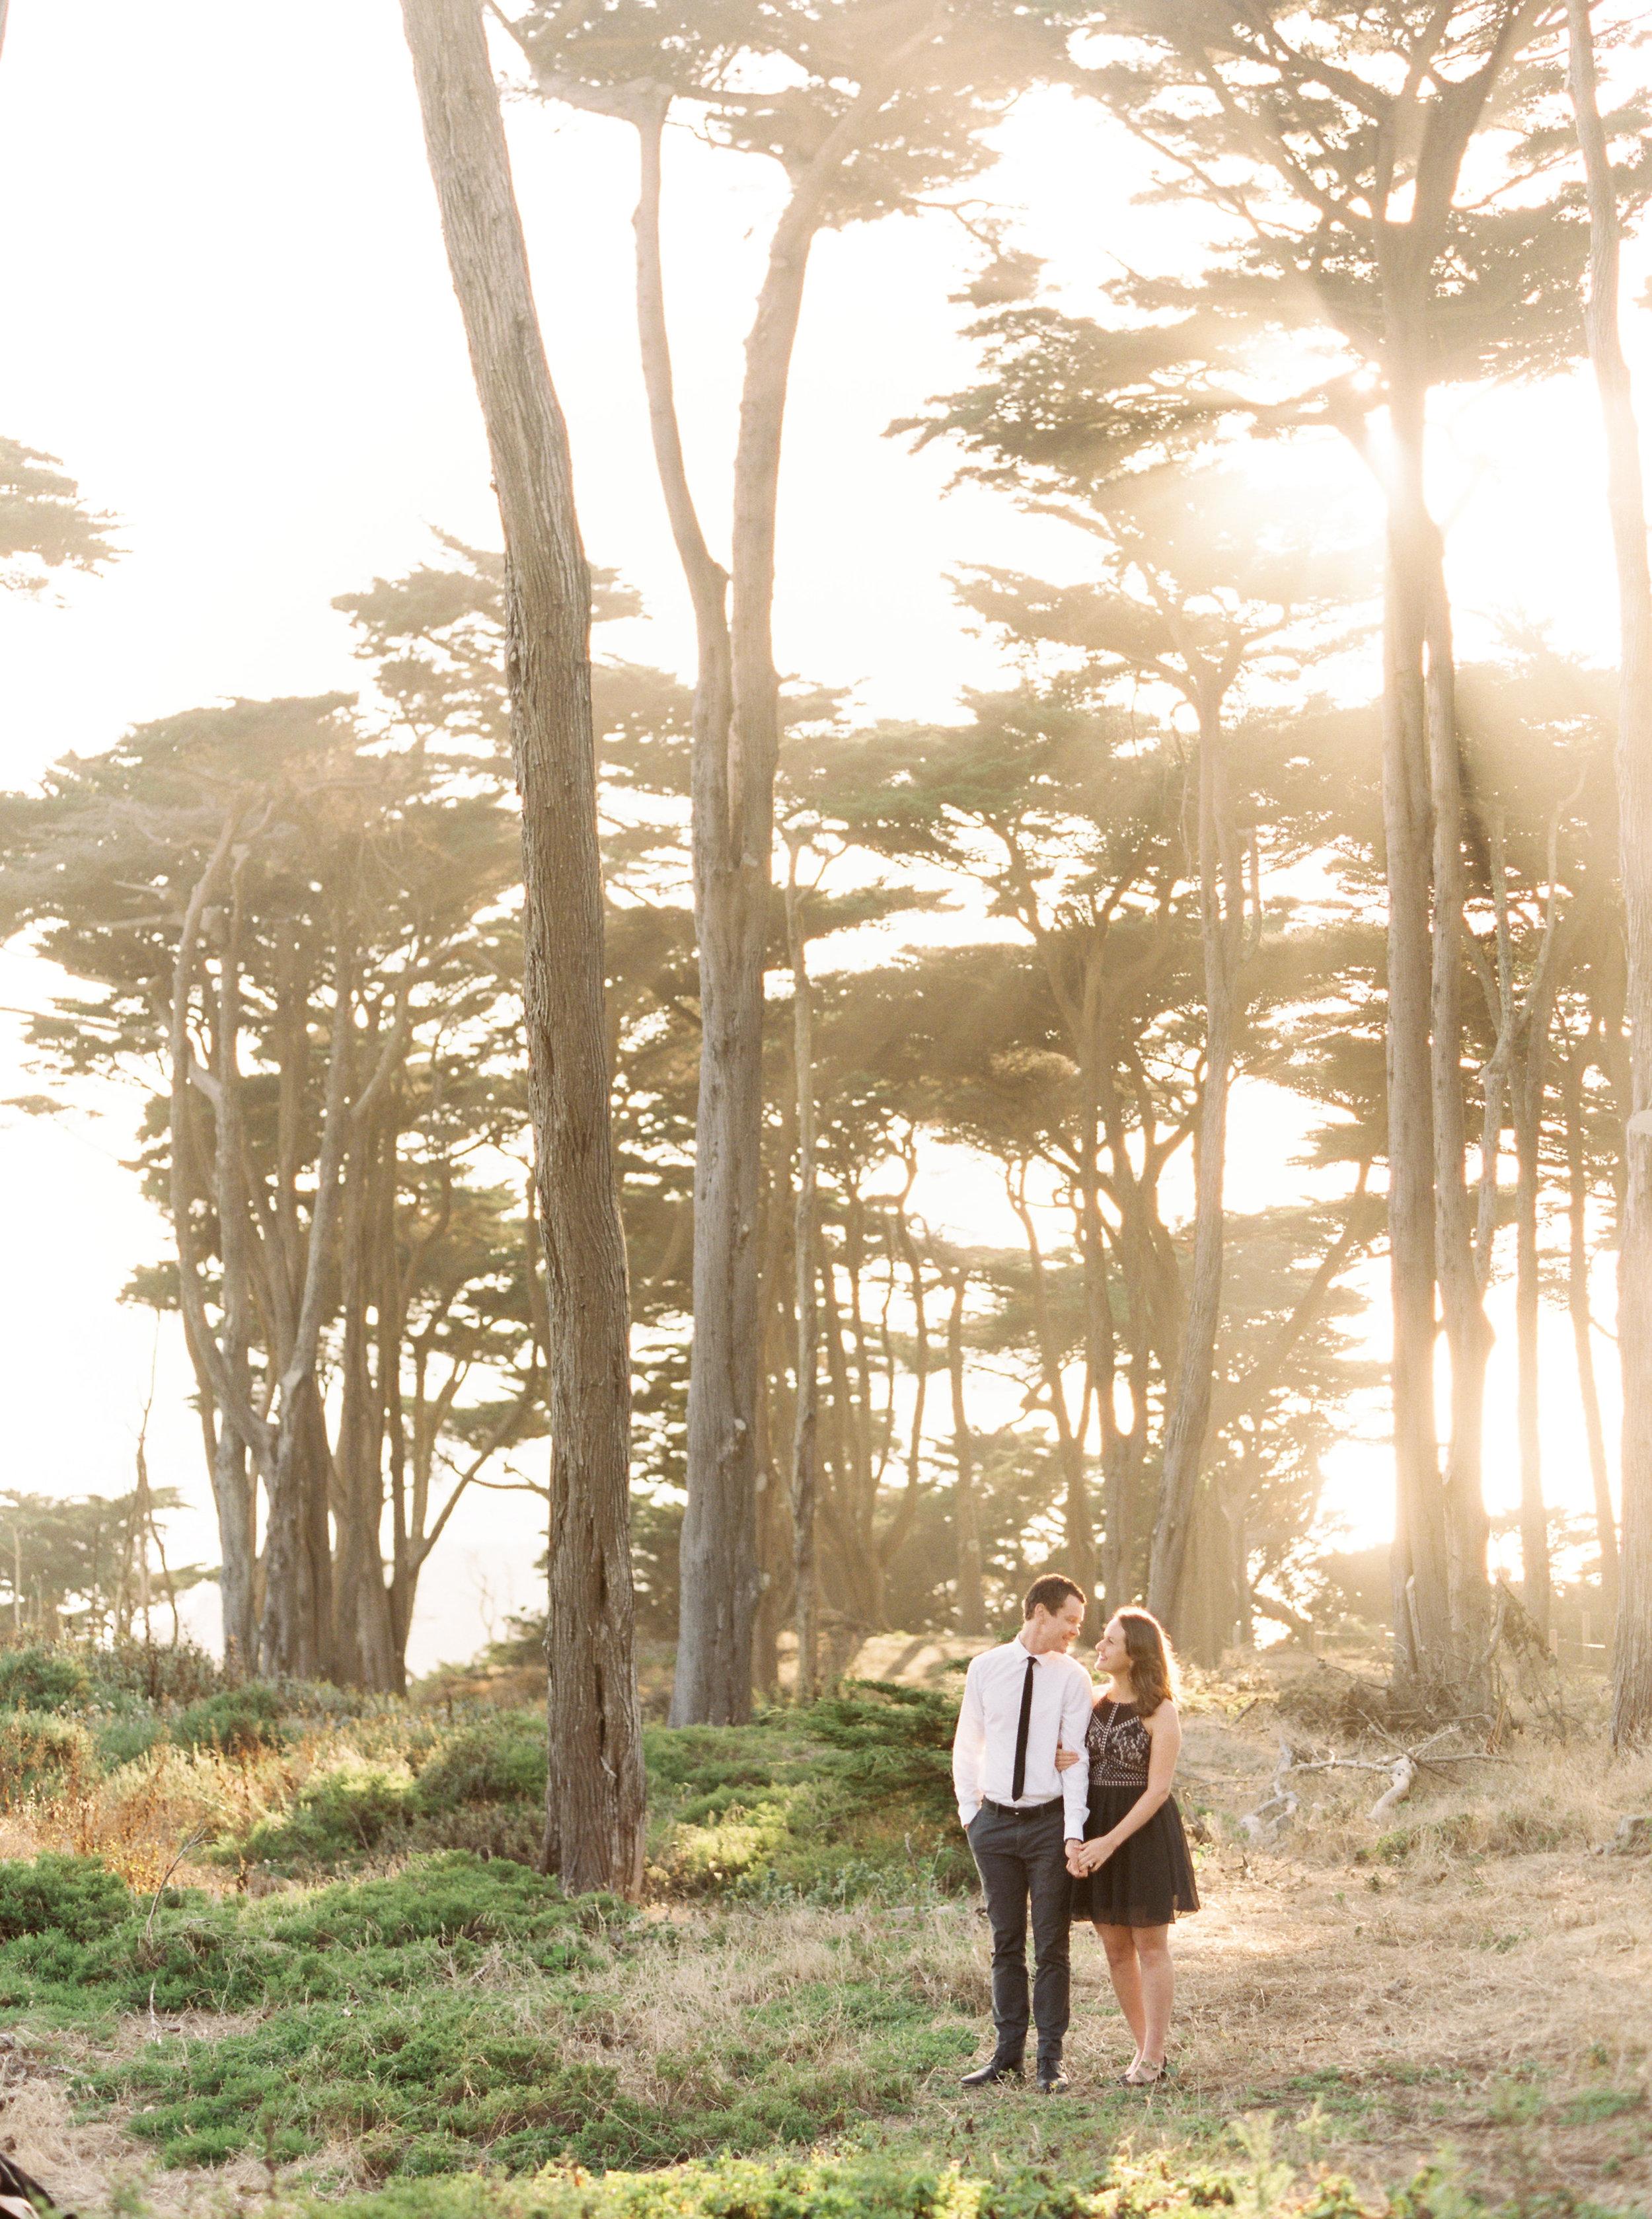 sutro-baths-san-francisco-california-engagement-5.jpg